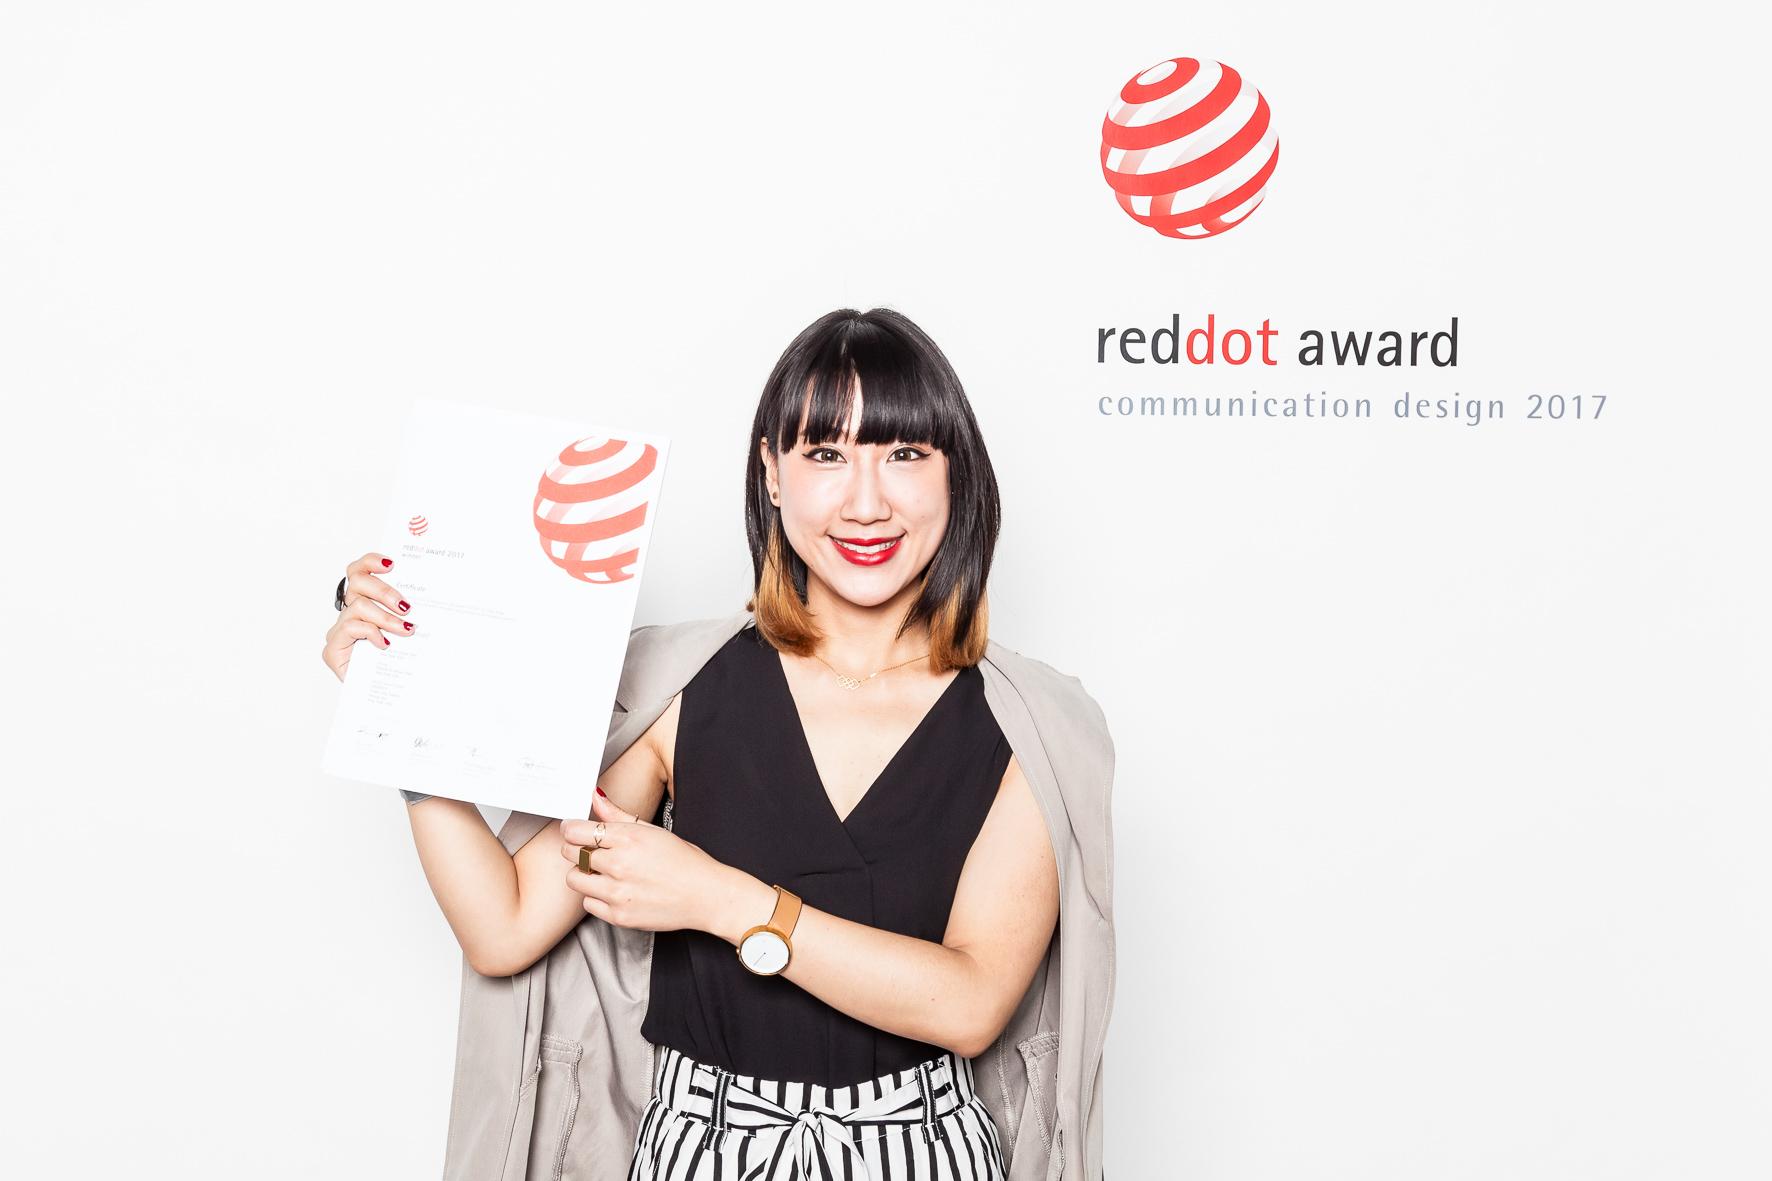 Reddot, Award, Winner, Achievement